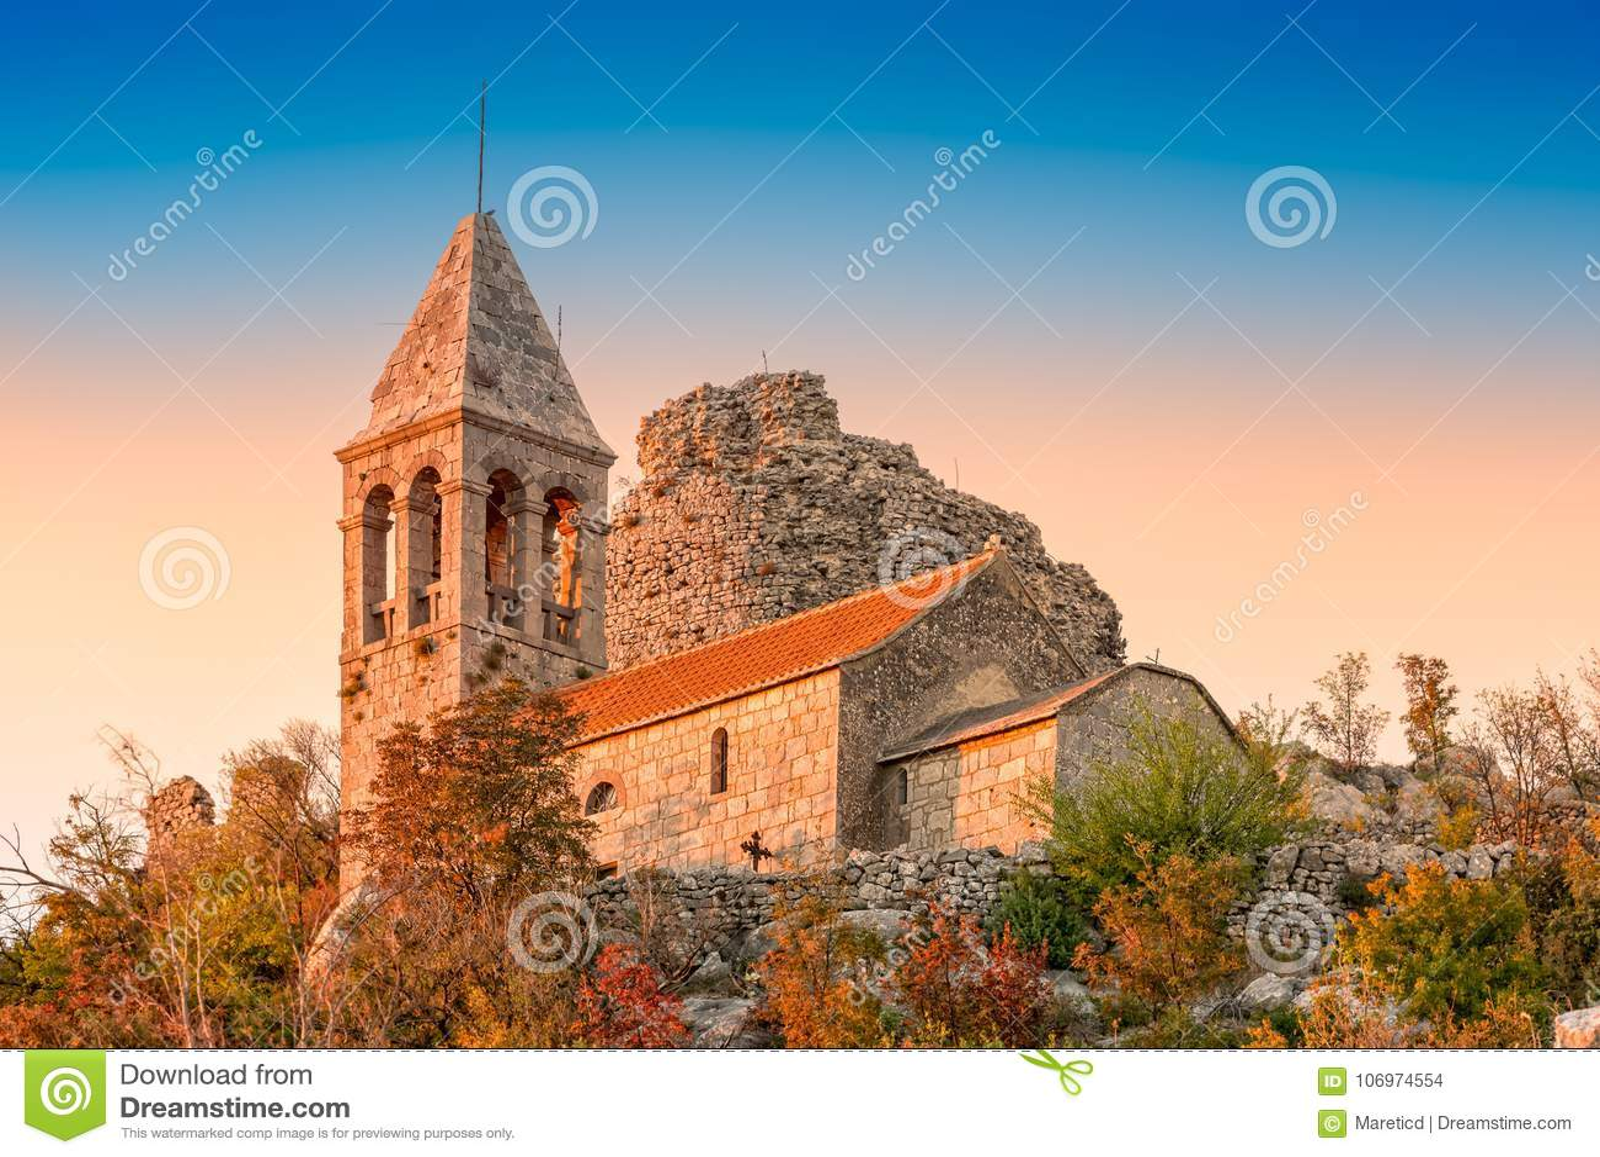 Ruins of fortress Čačvina and church All the Saints